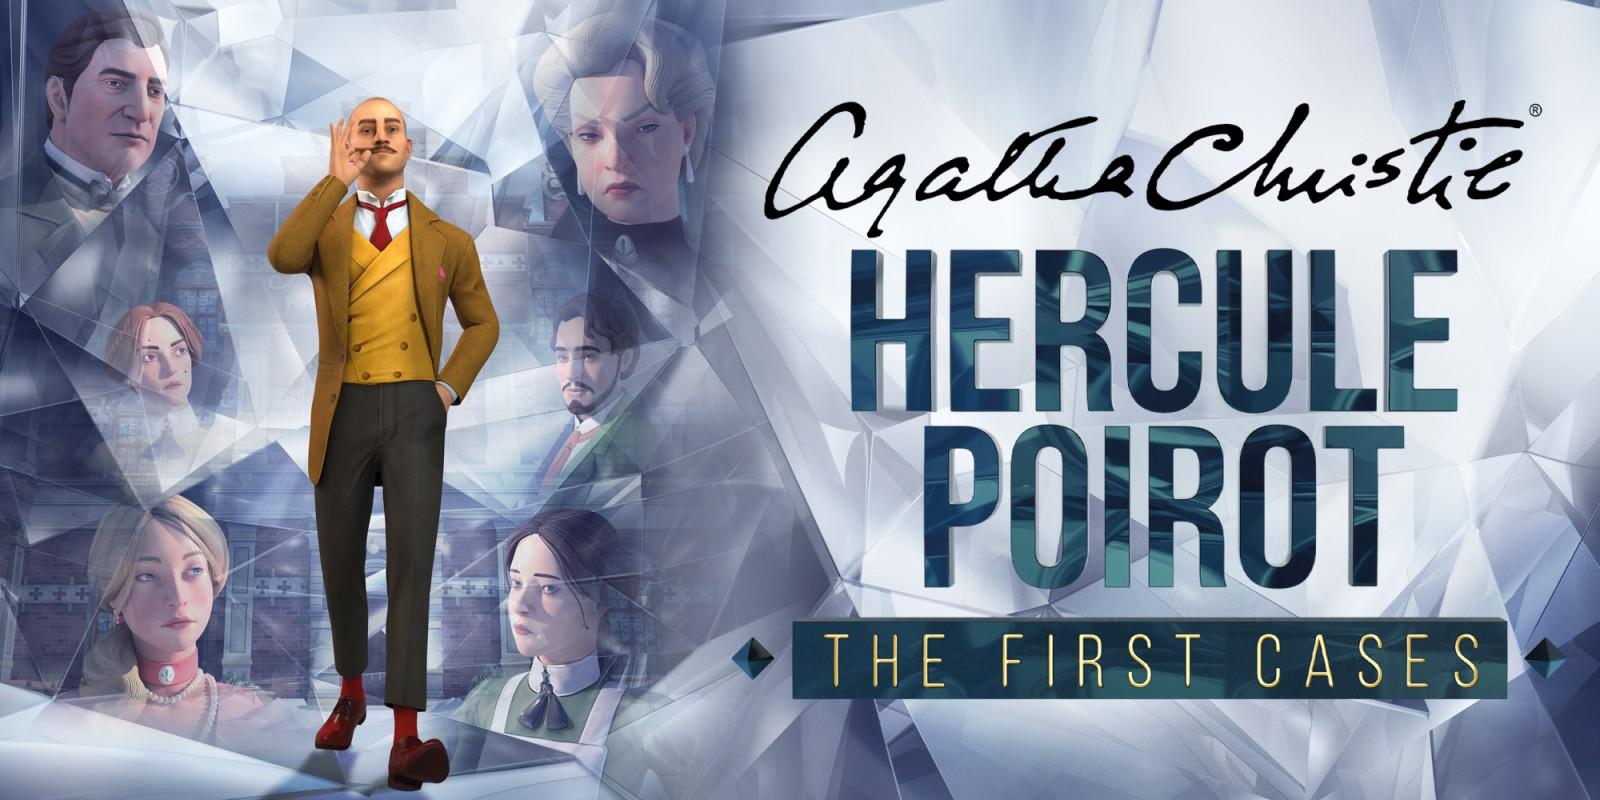 Agatha Christie - Hercule Poirot: The First Cases | Nintendo Switch | Giochi | Nintendo